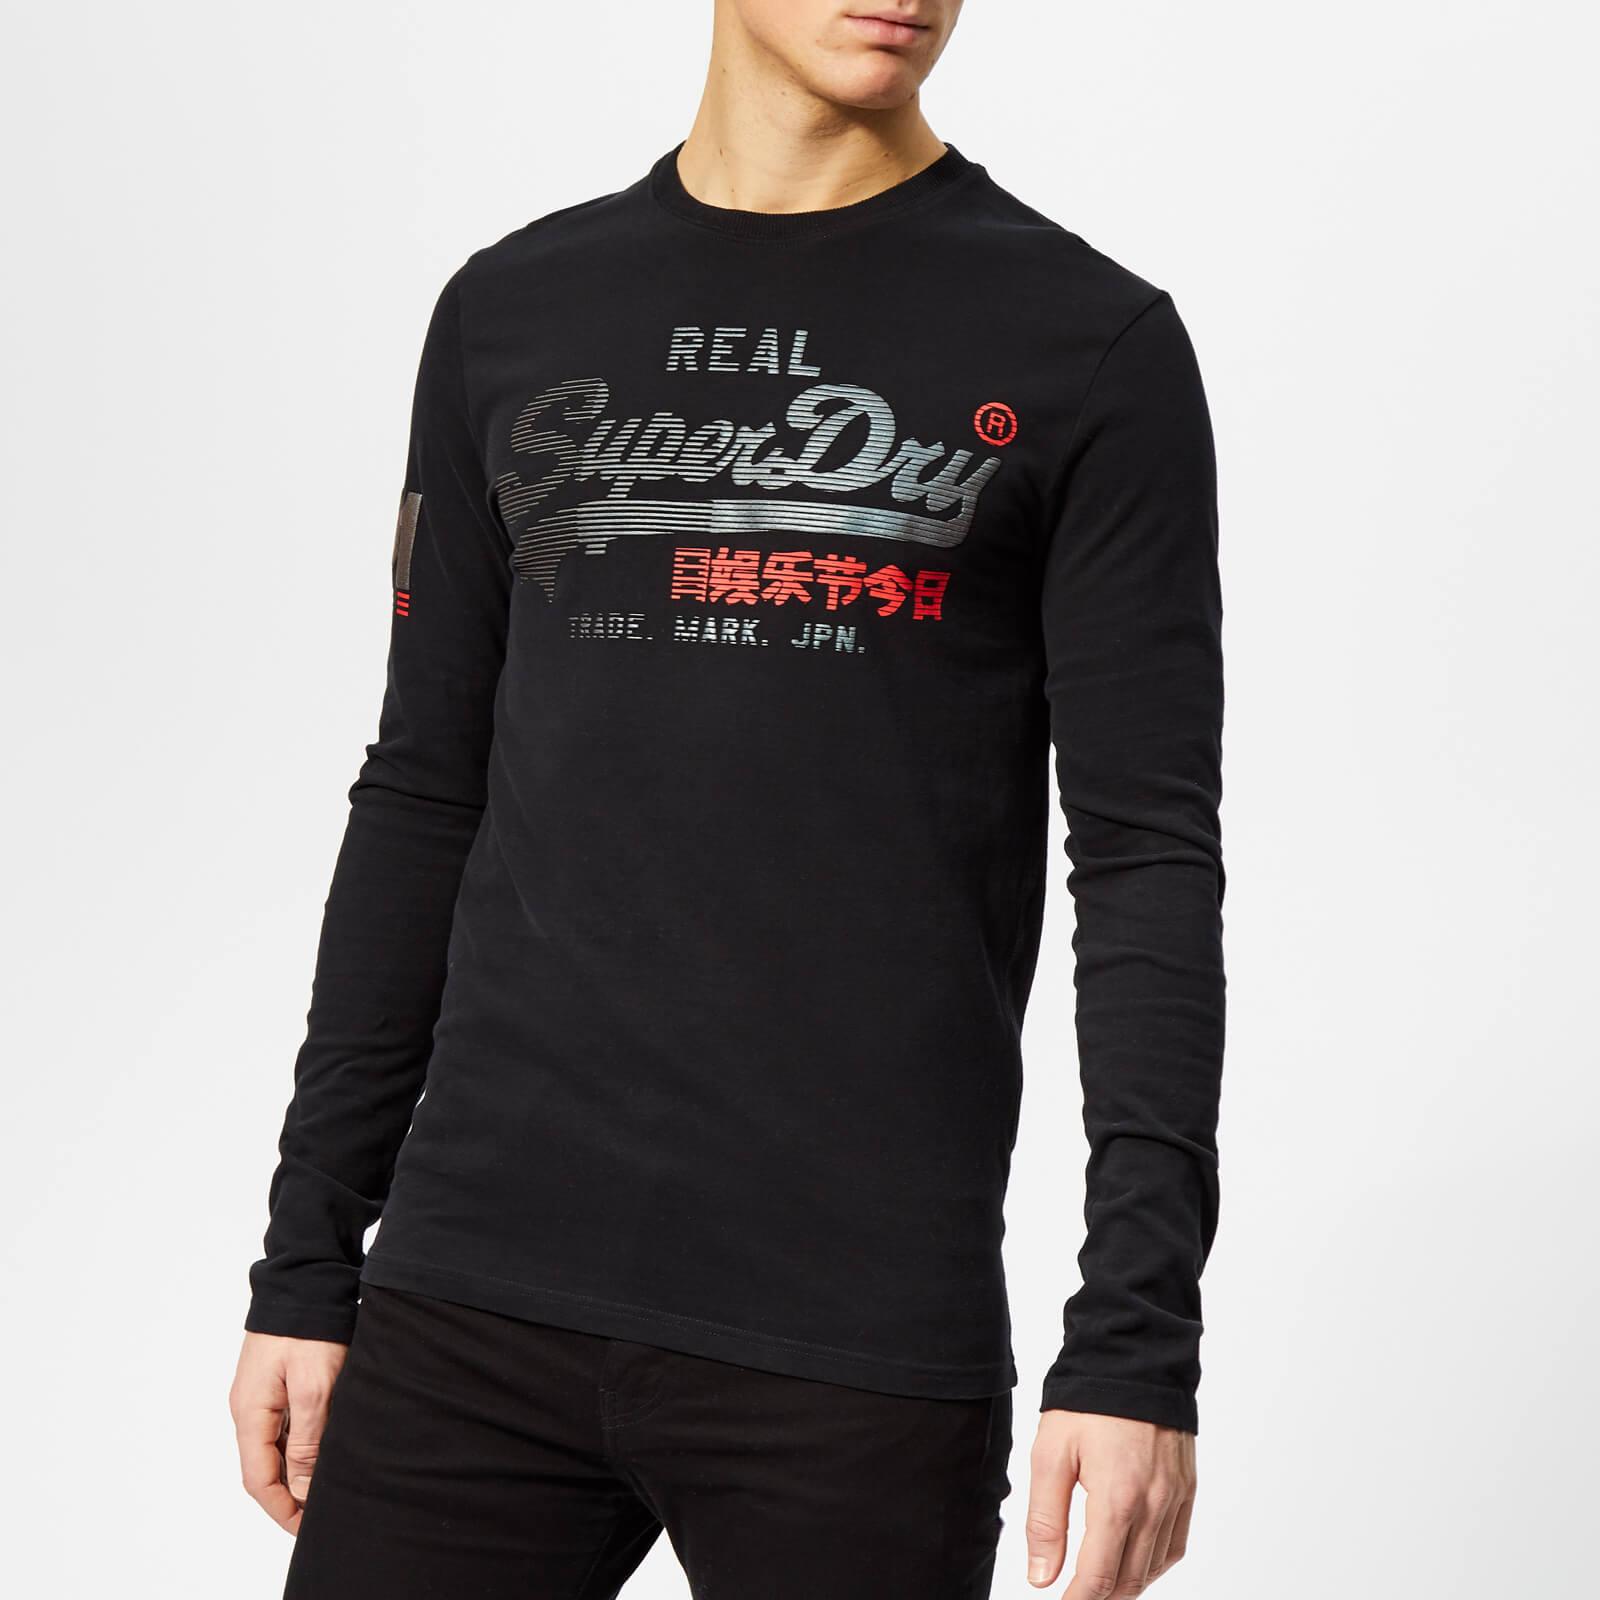 Superdry Men's Vintage Logo 1st Duo Long Sleeve T-Shirt - Black - L - Black